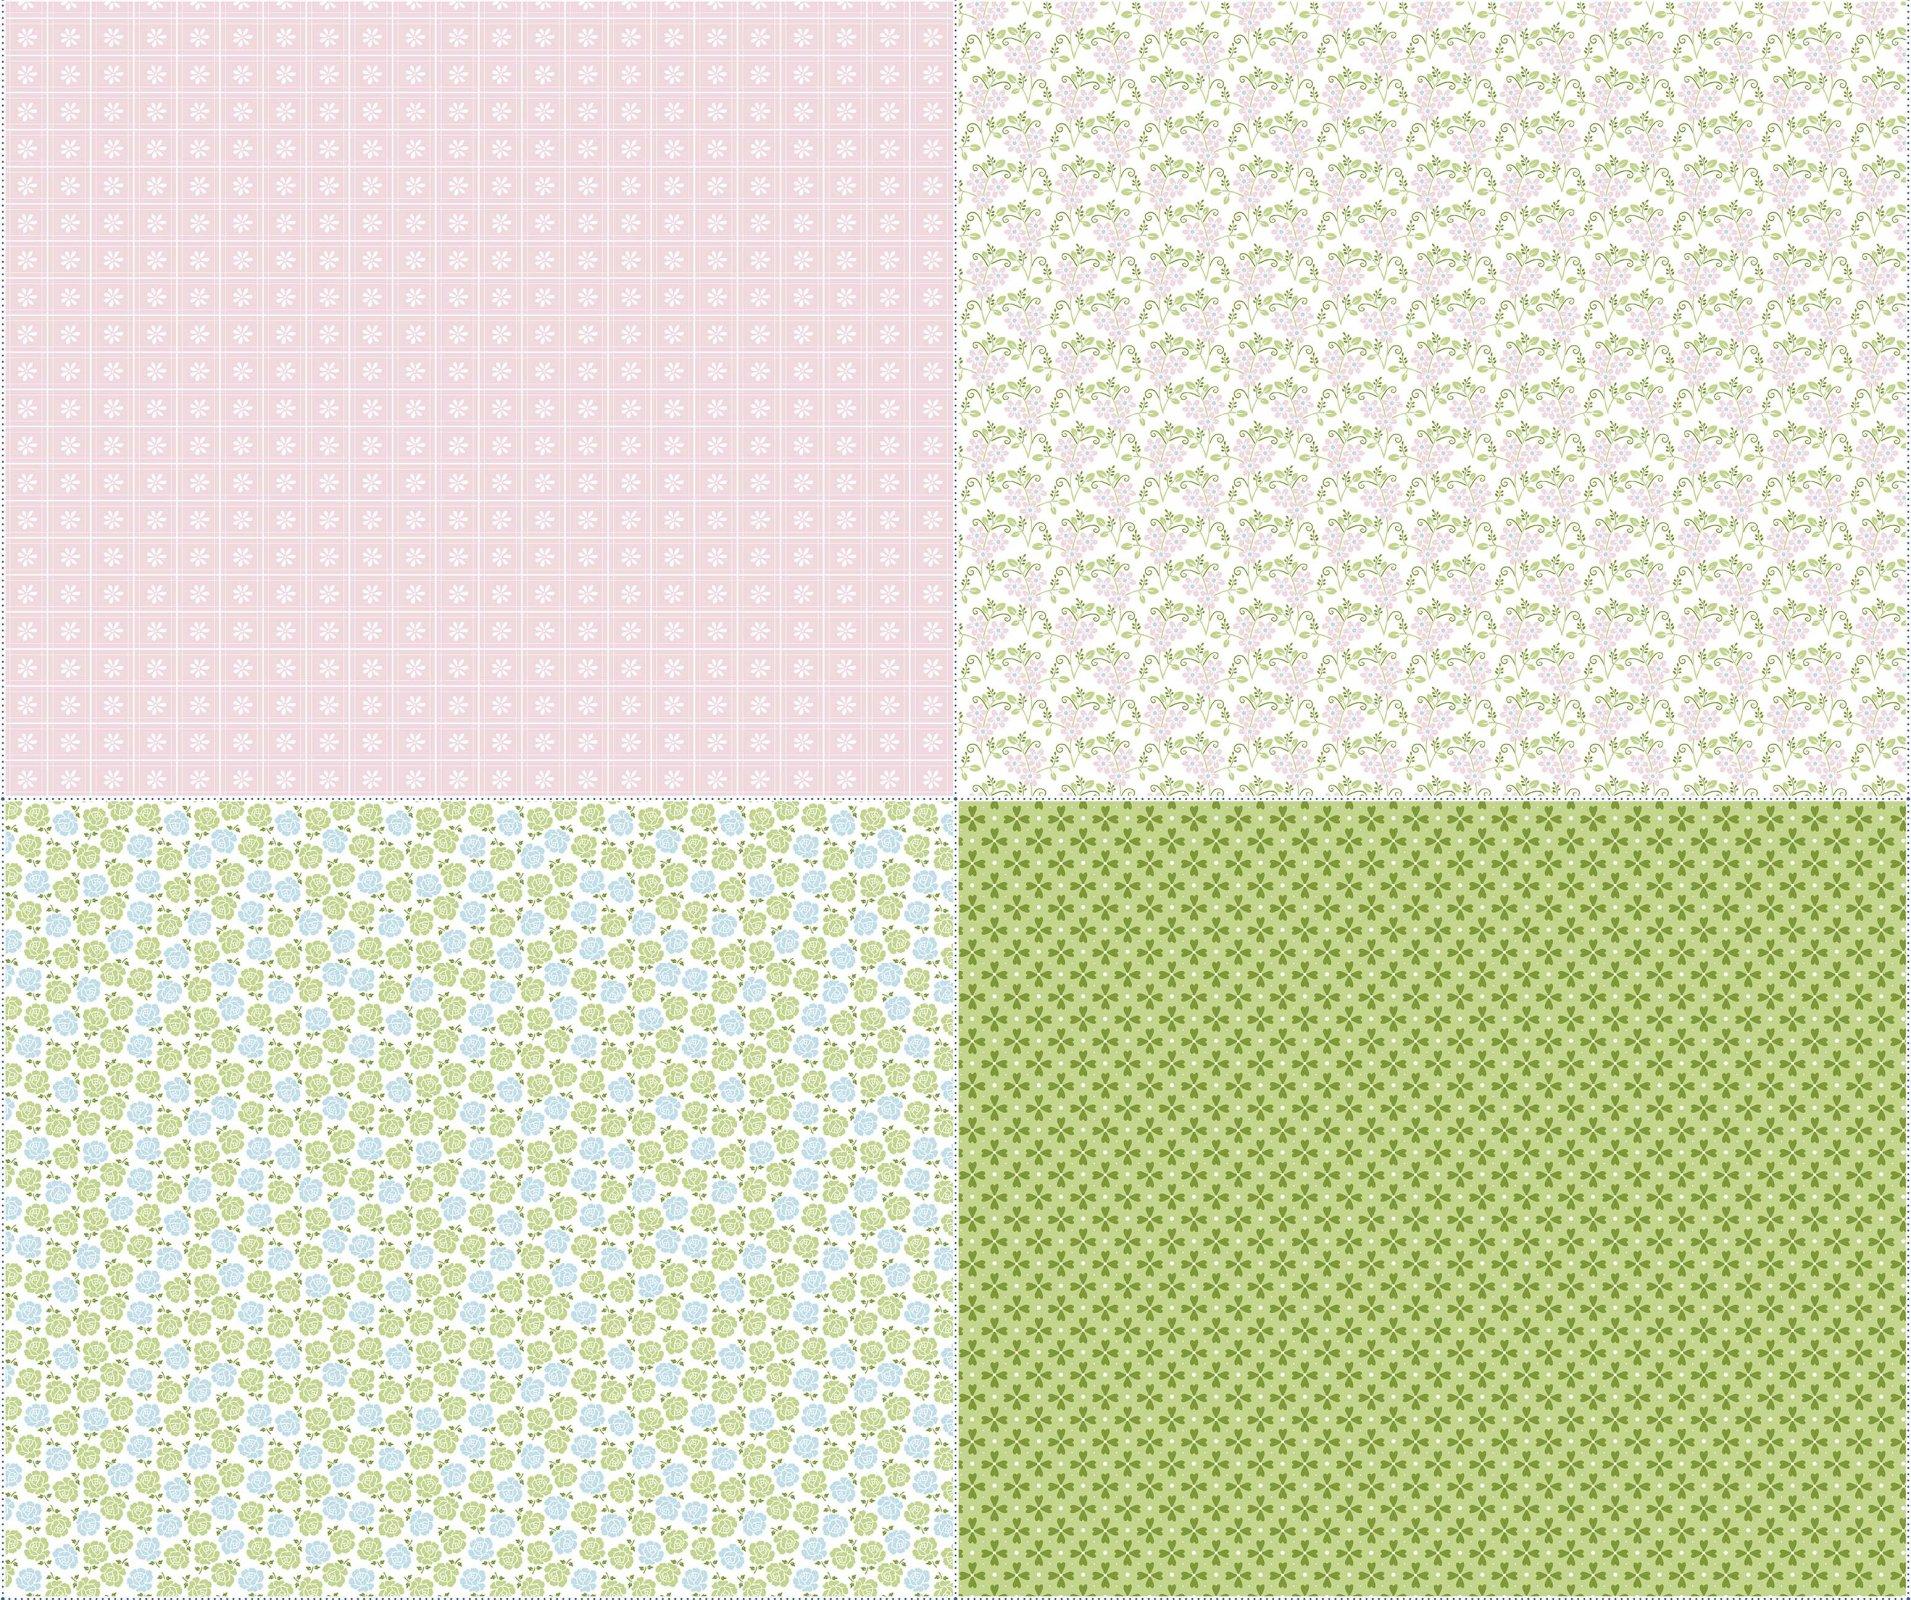 Sew Cherry 2 FQ Panel FQP5809 Pink